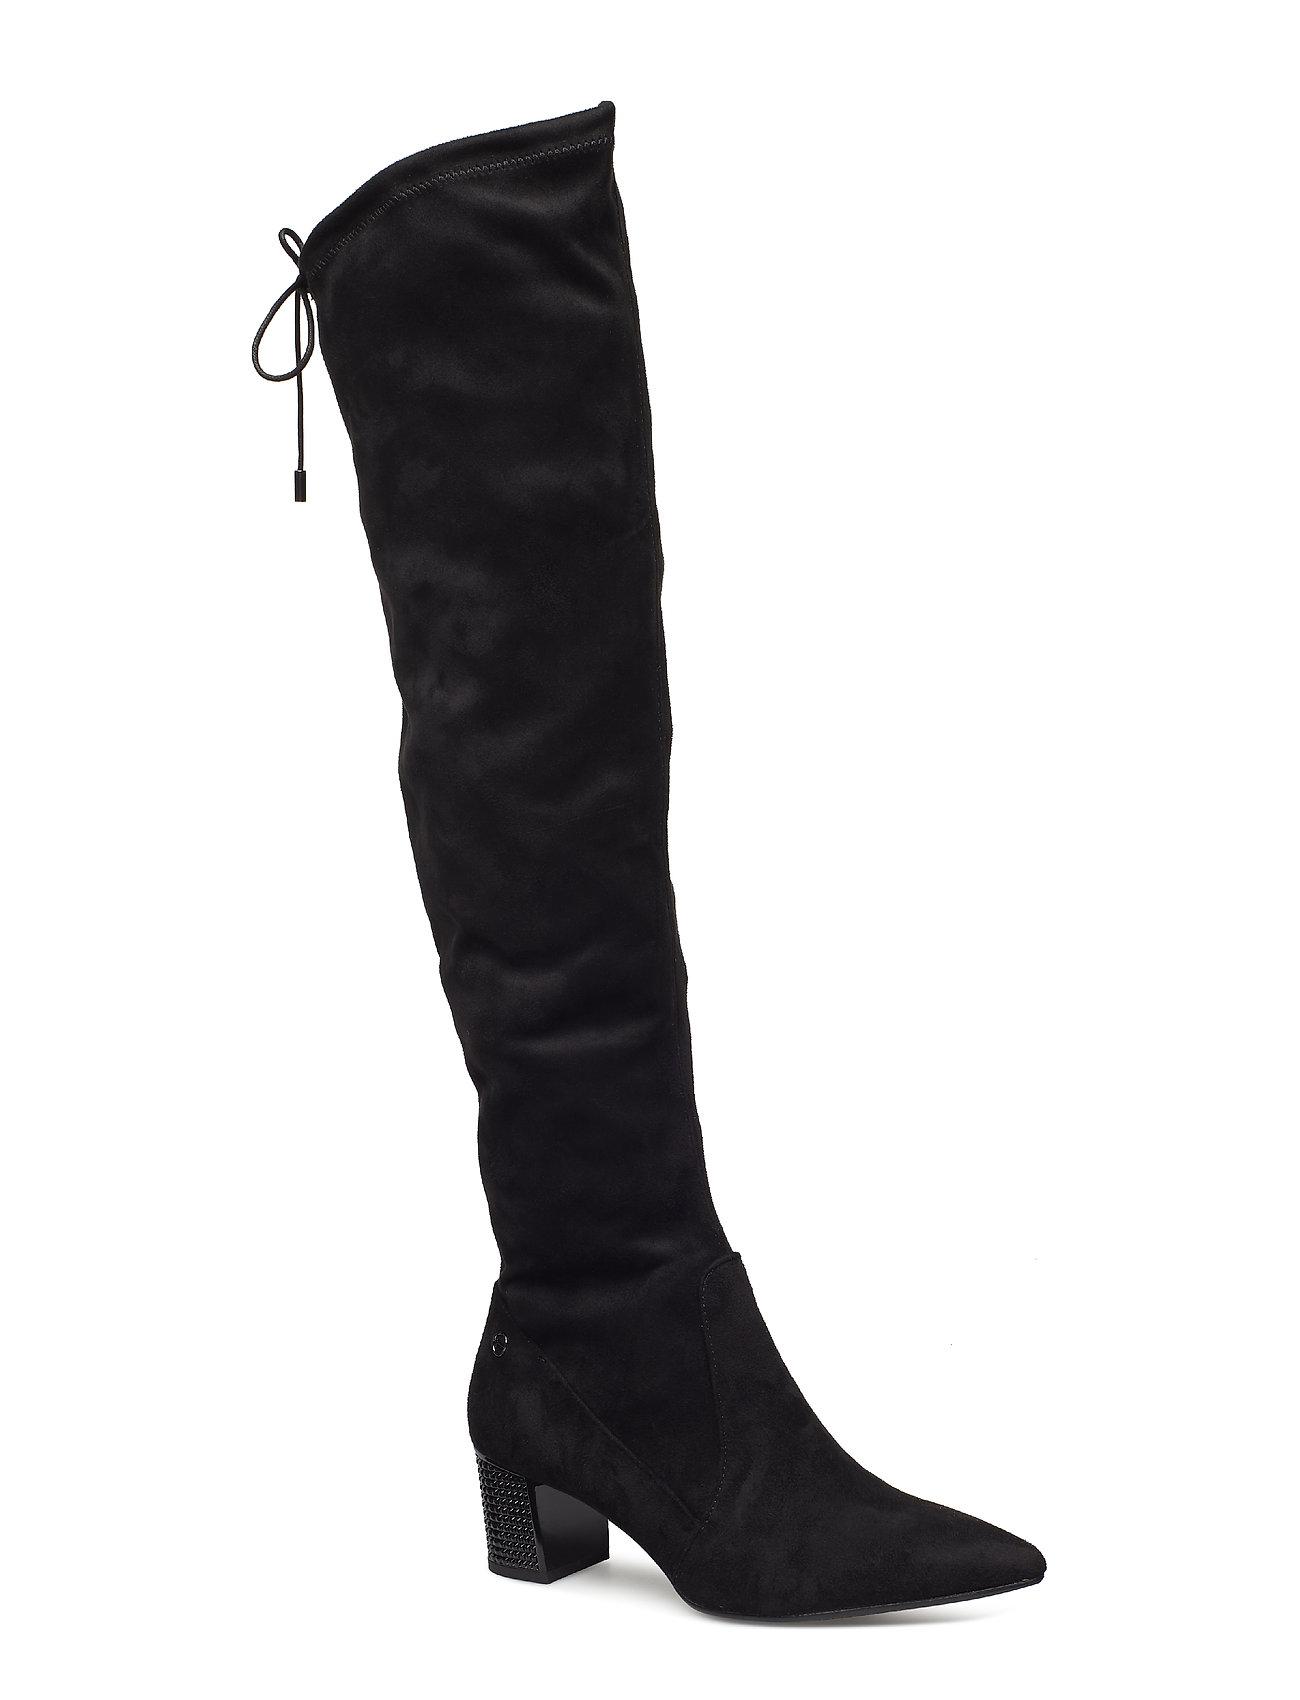 Woms Boots (Black) (53.97 €) - Tamaris - Schoenen  2784e3834c